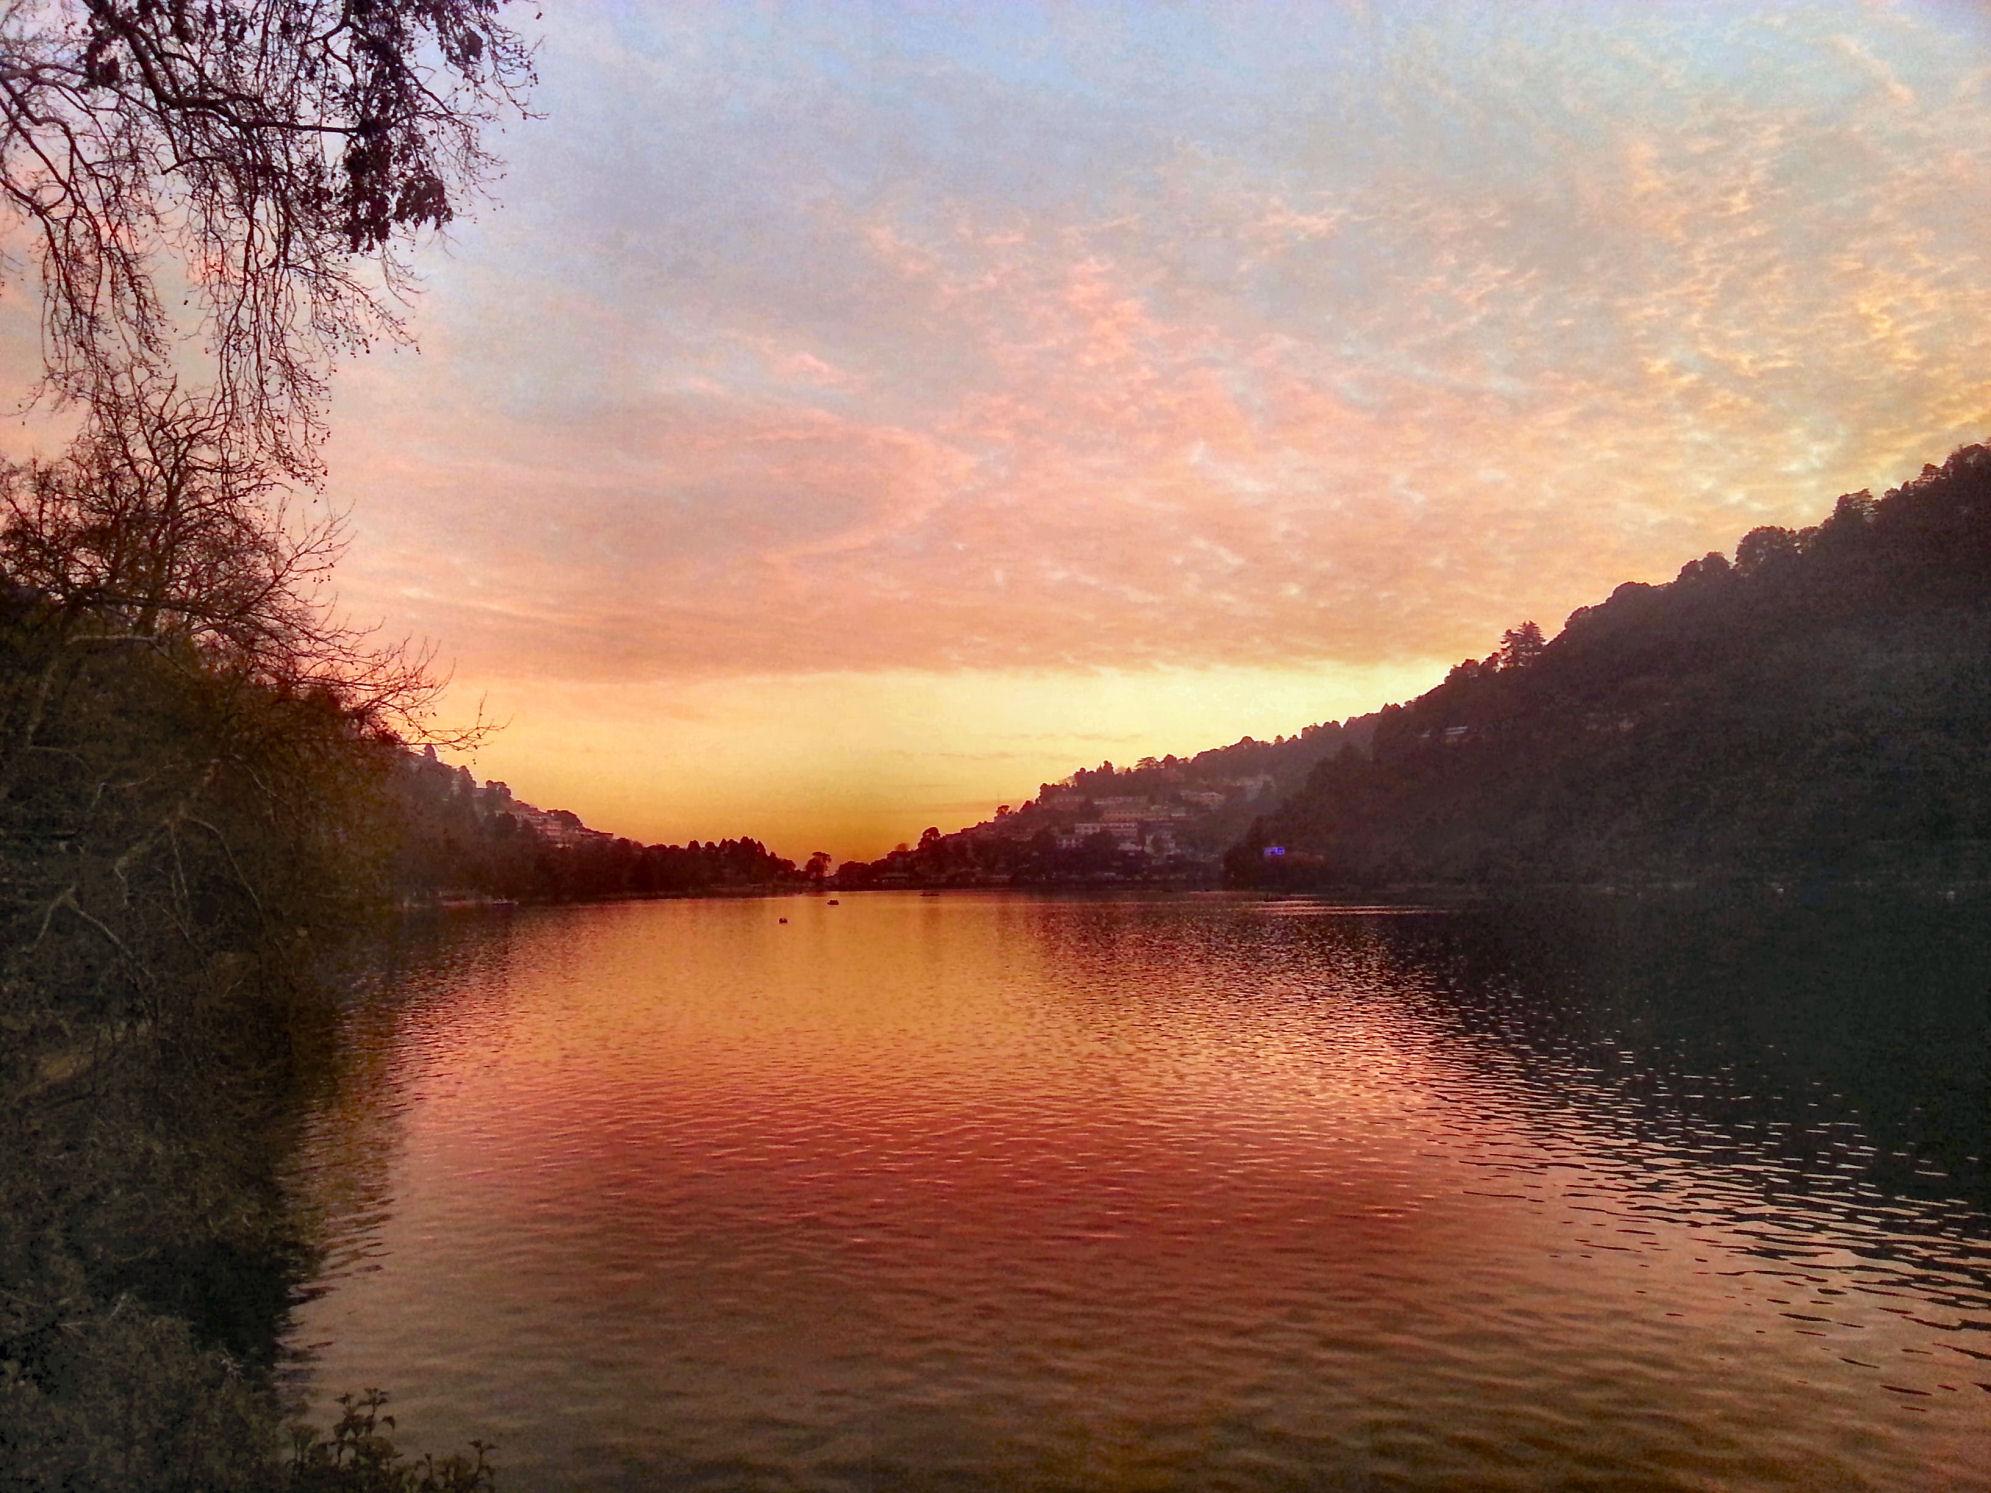 Picture taken during a vivid winter sunset at Naini Lake, Nainital, Uttarakhand, India